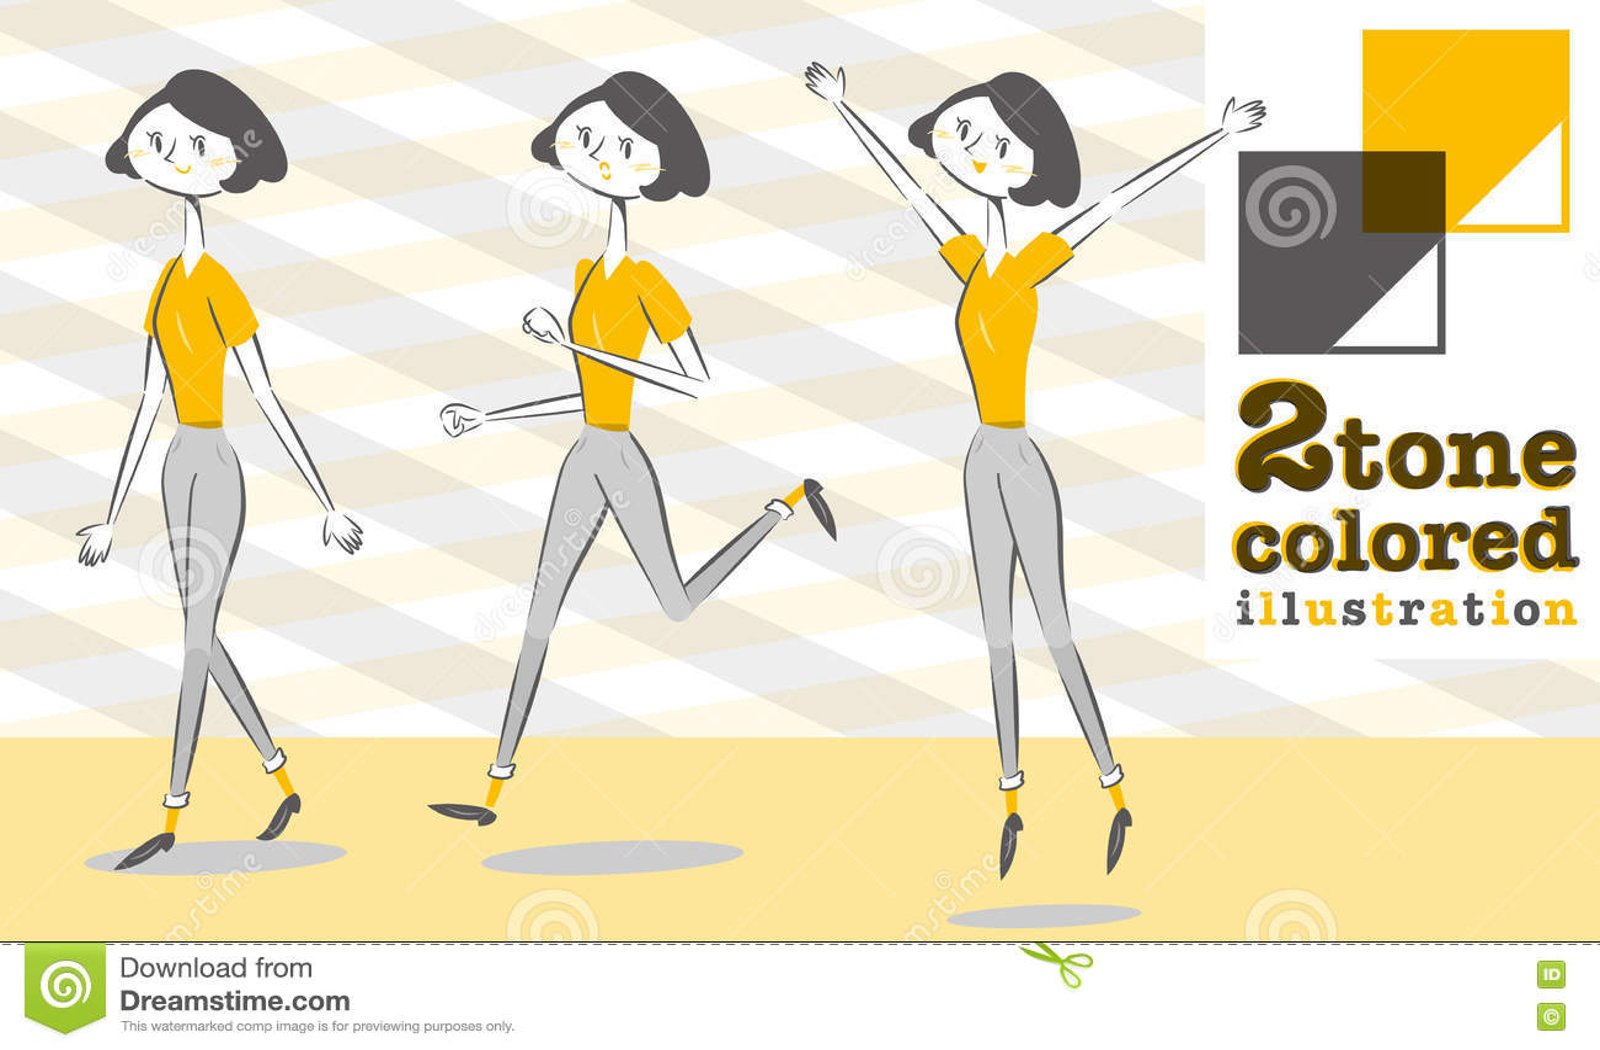 Woman Pants Style In Smart Form Walk Run Jump Stock Vector